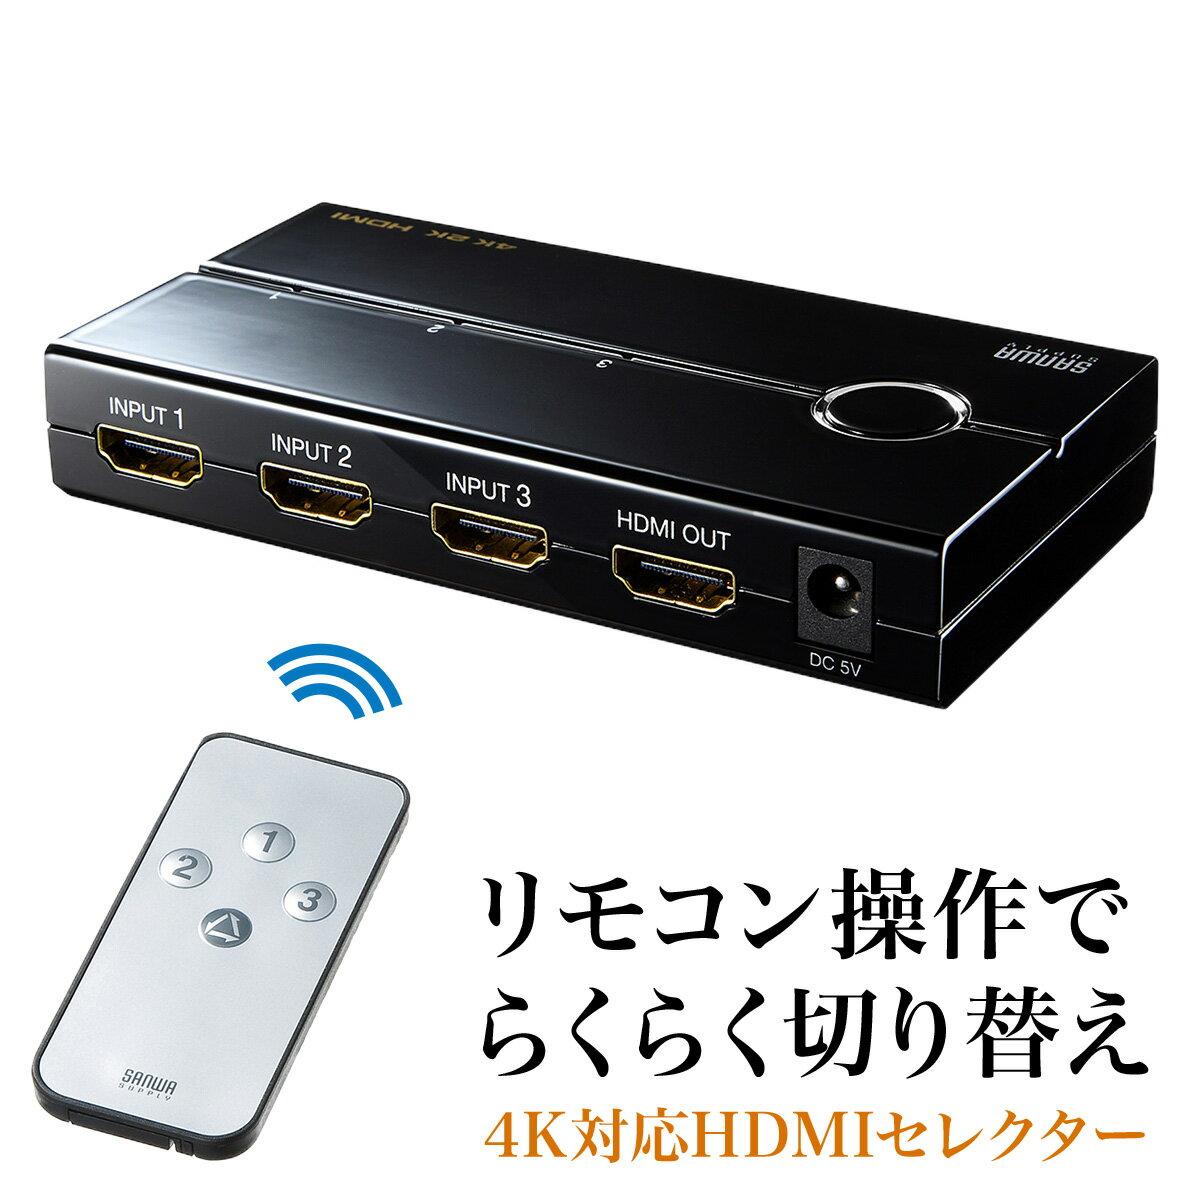 HDMI切替器 HDMI セレクター 3入力1出力 4K2K対応 リモコン付 PS4対応 自動切り替えなし 電源不要 USB給電ケーブル付 [400-SW019]【サンワダイレクト限定品】【送料無料】